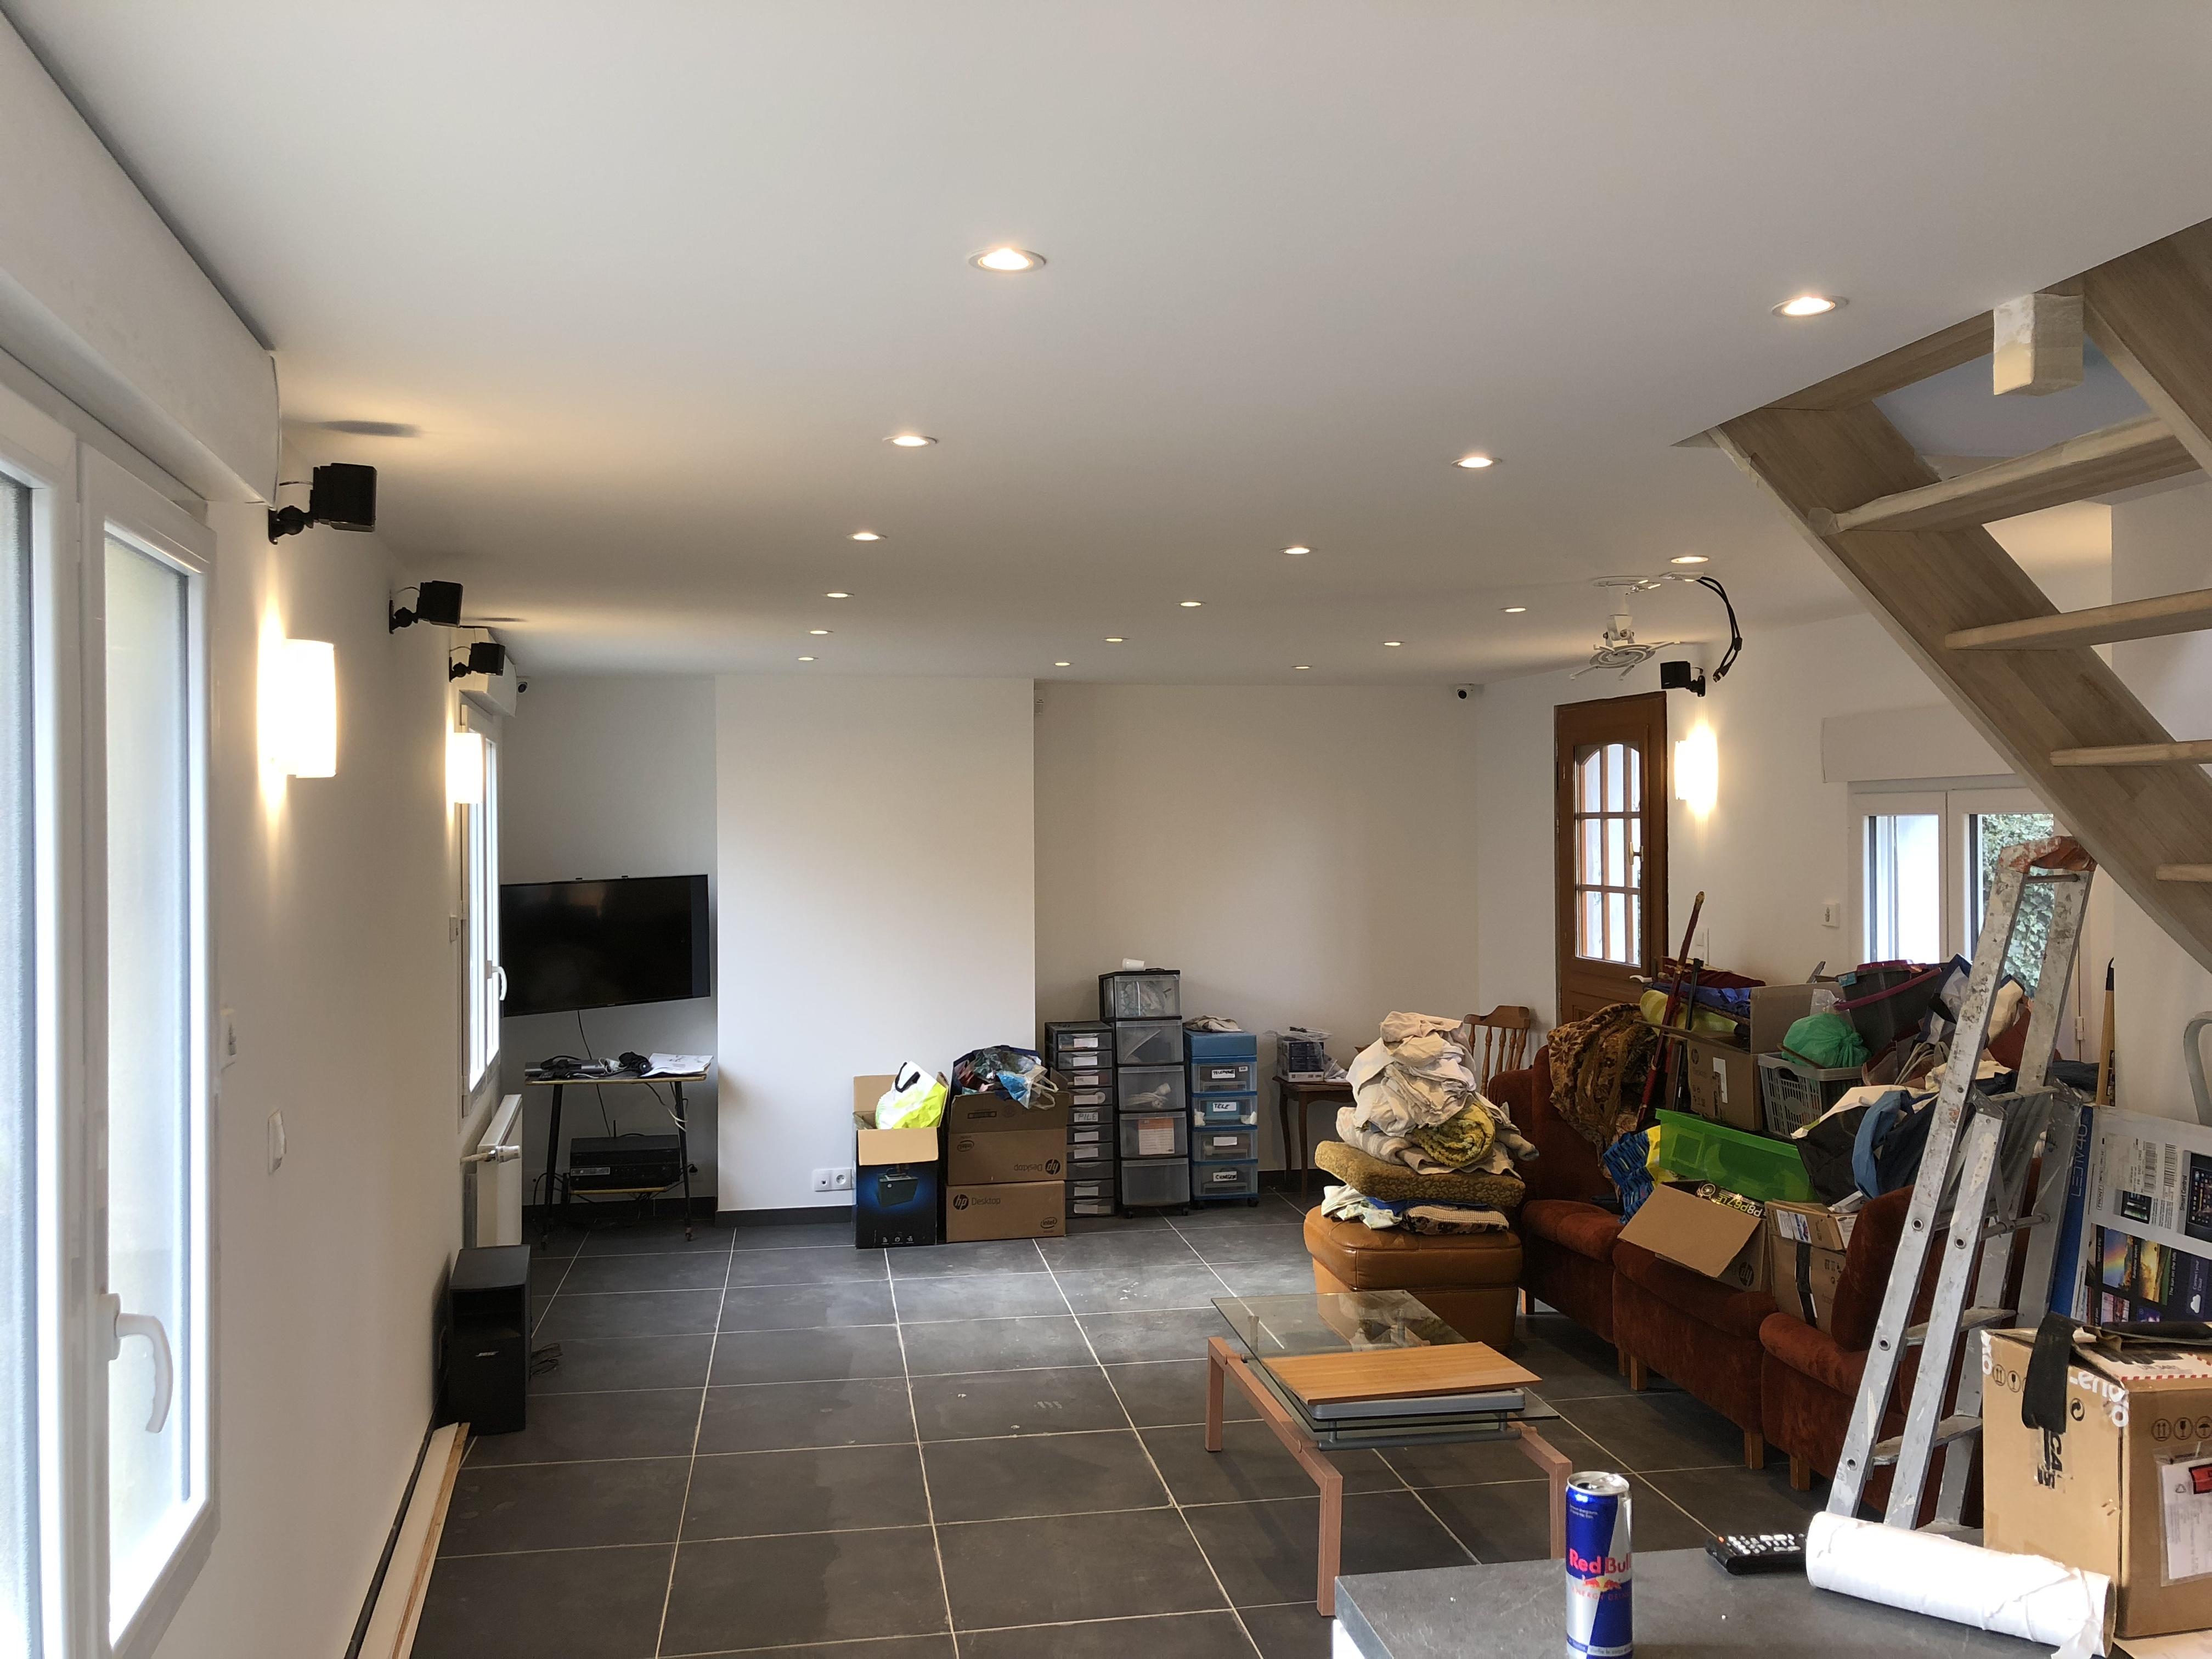 Rénovation mur, plafond & pose carrelage sol